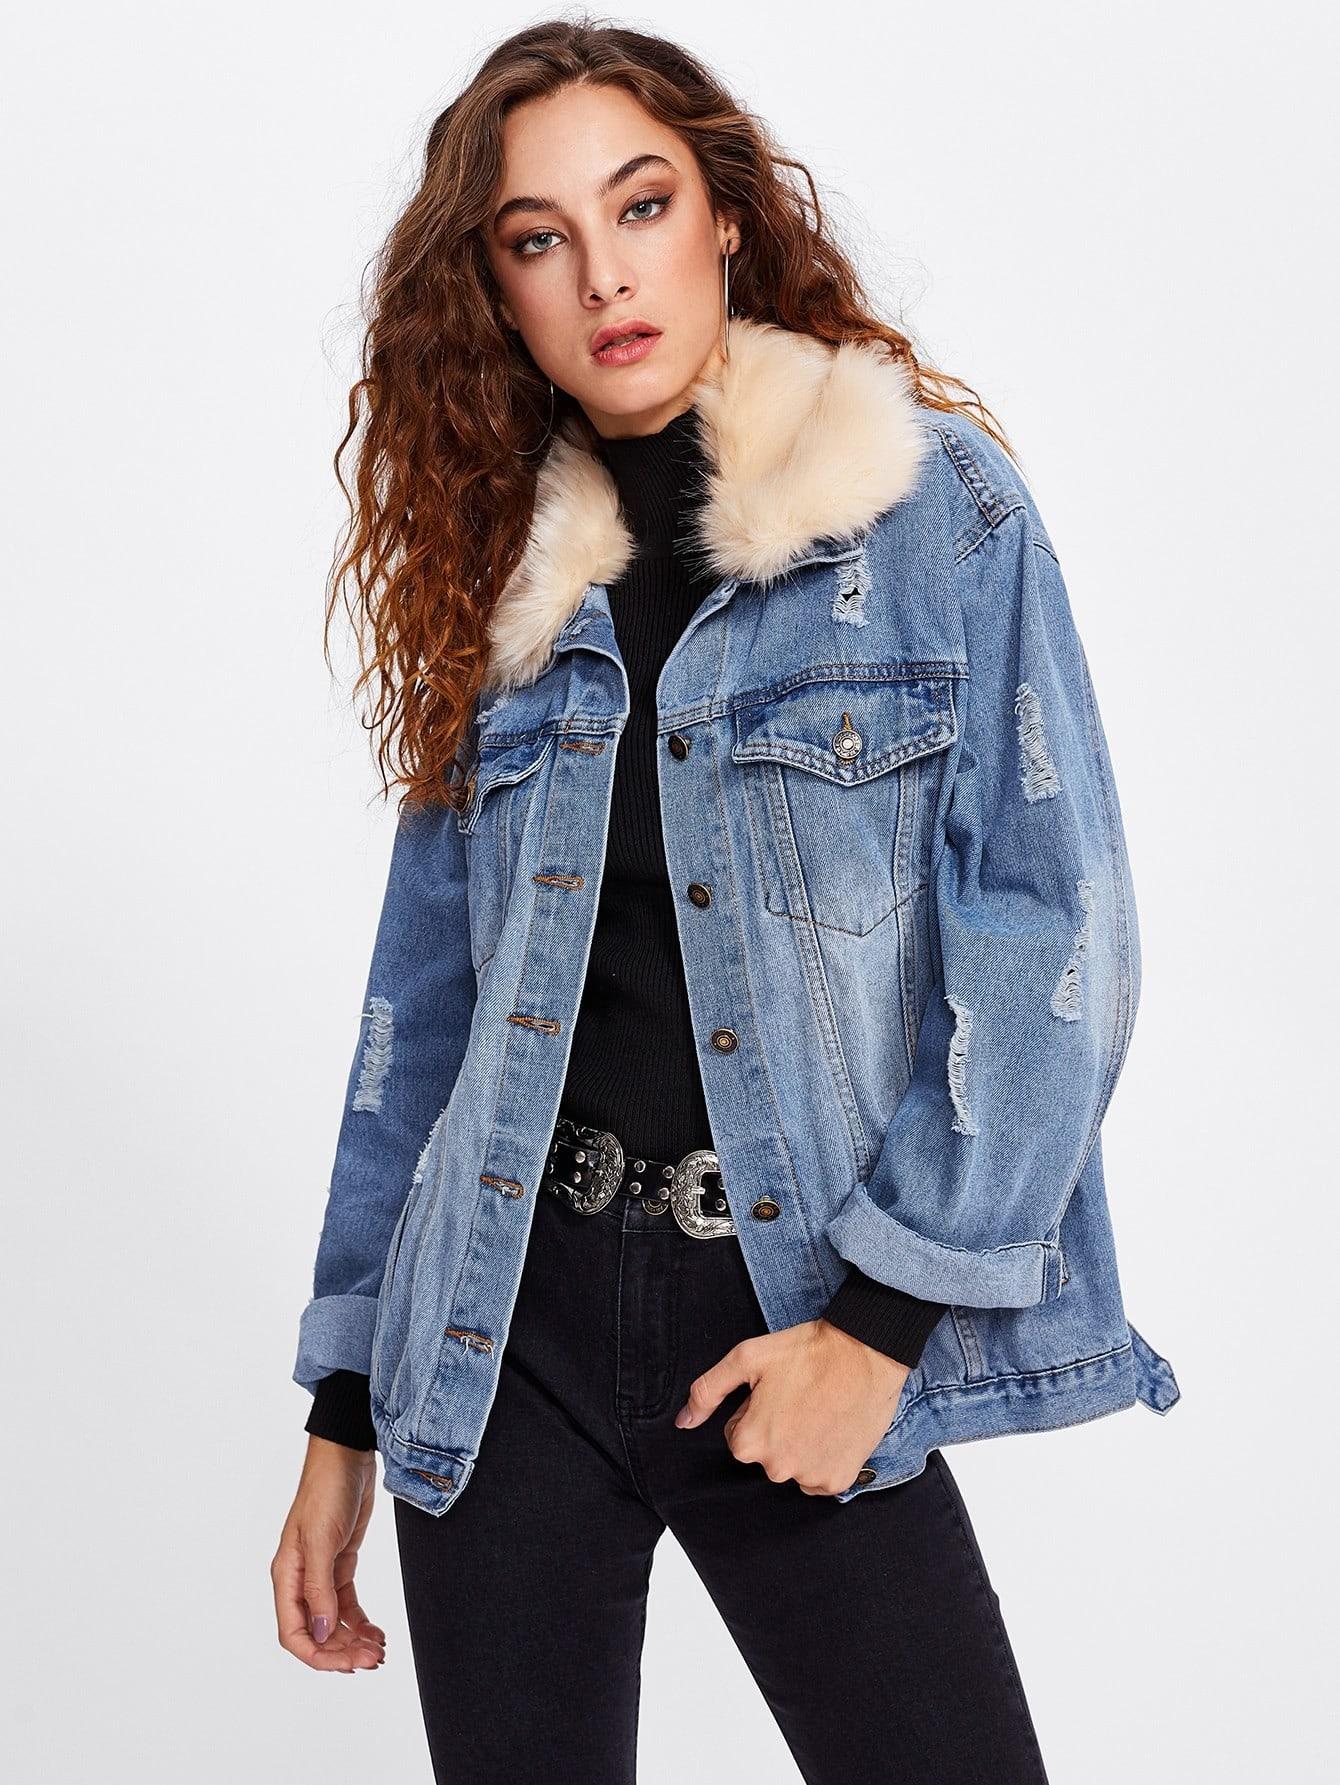 Contrast Faux Fur Collar Ripped Detail Jacket drop shoulder contrast faux fur sleeve sweatshirt